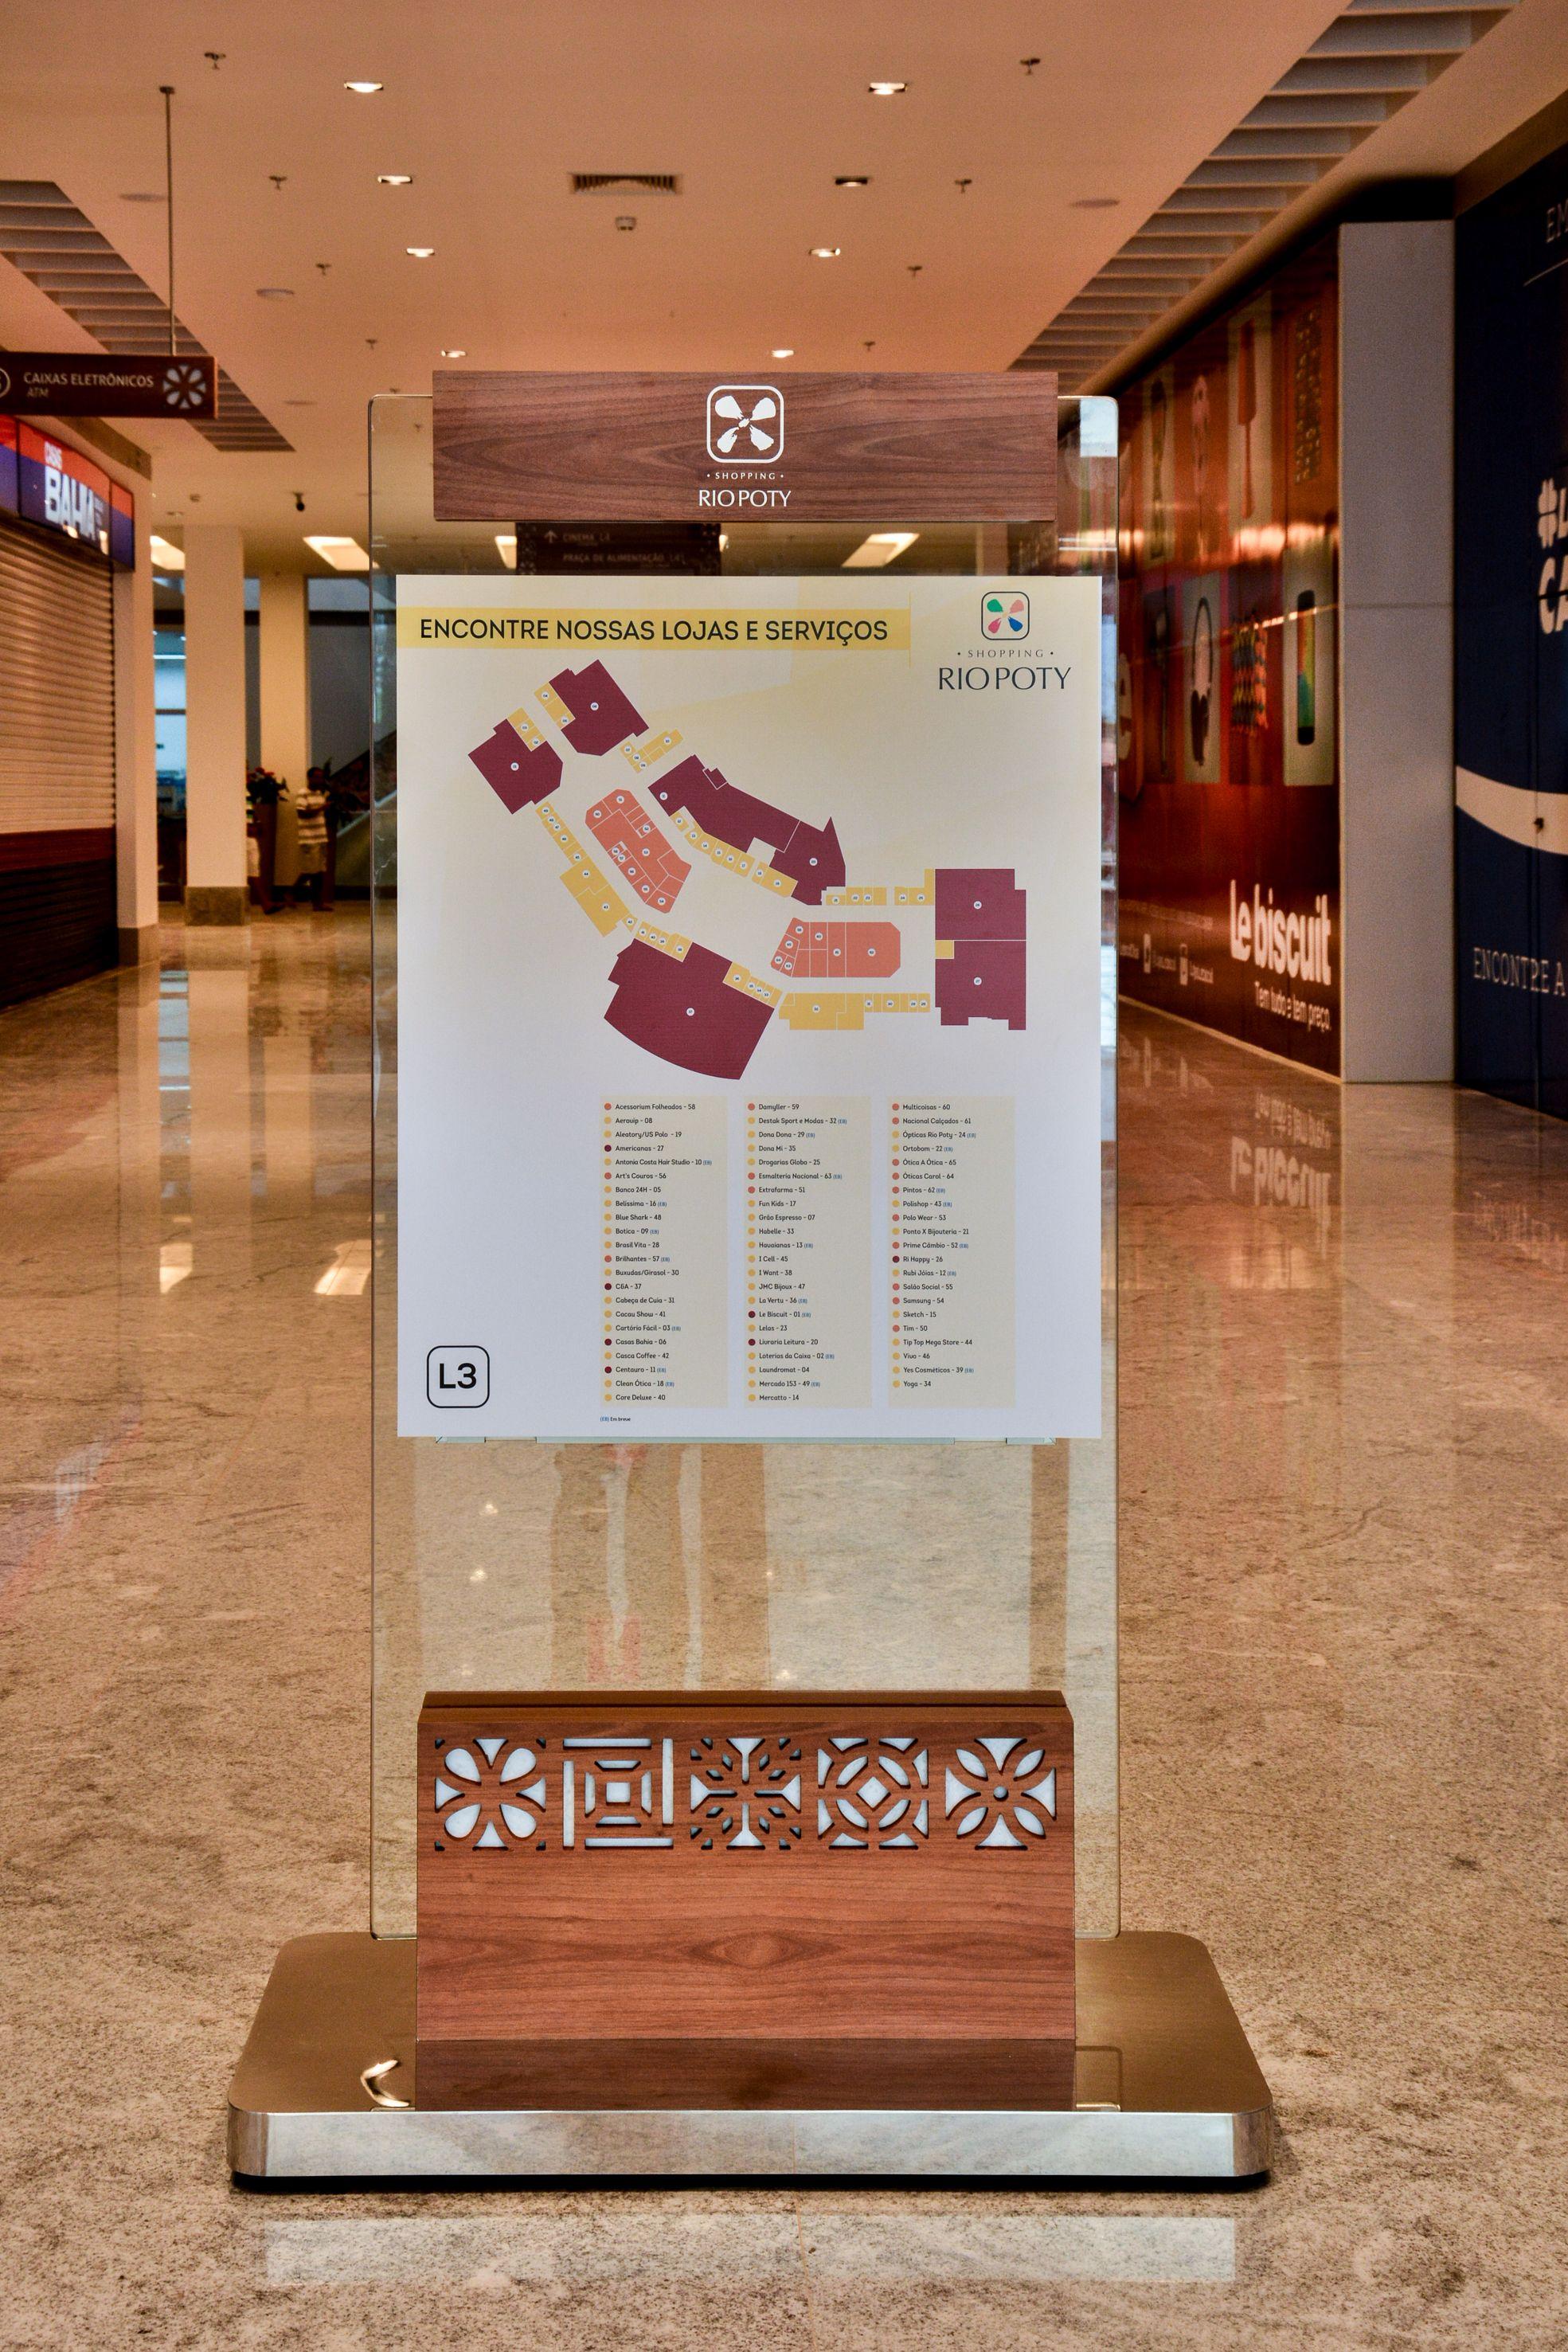 c41bb96c8291d  Wayfinding-  totensign - shoppingriopoty - Brazil brazilian design   design shopping  malls